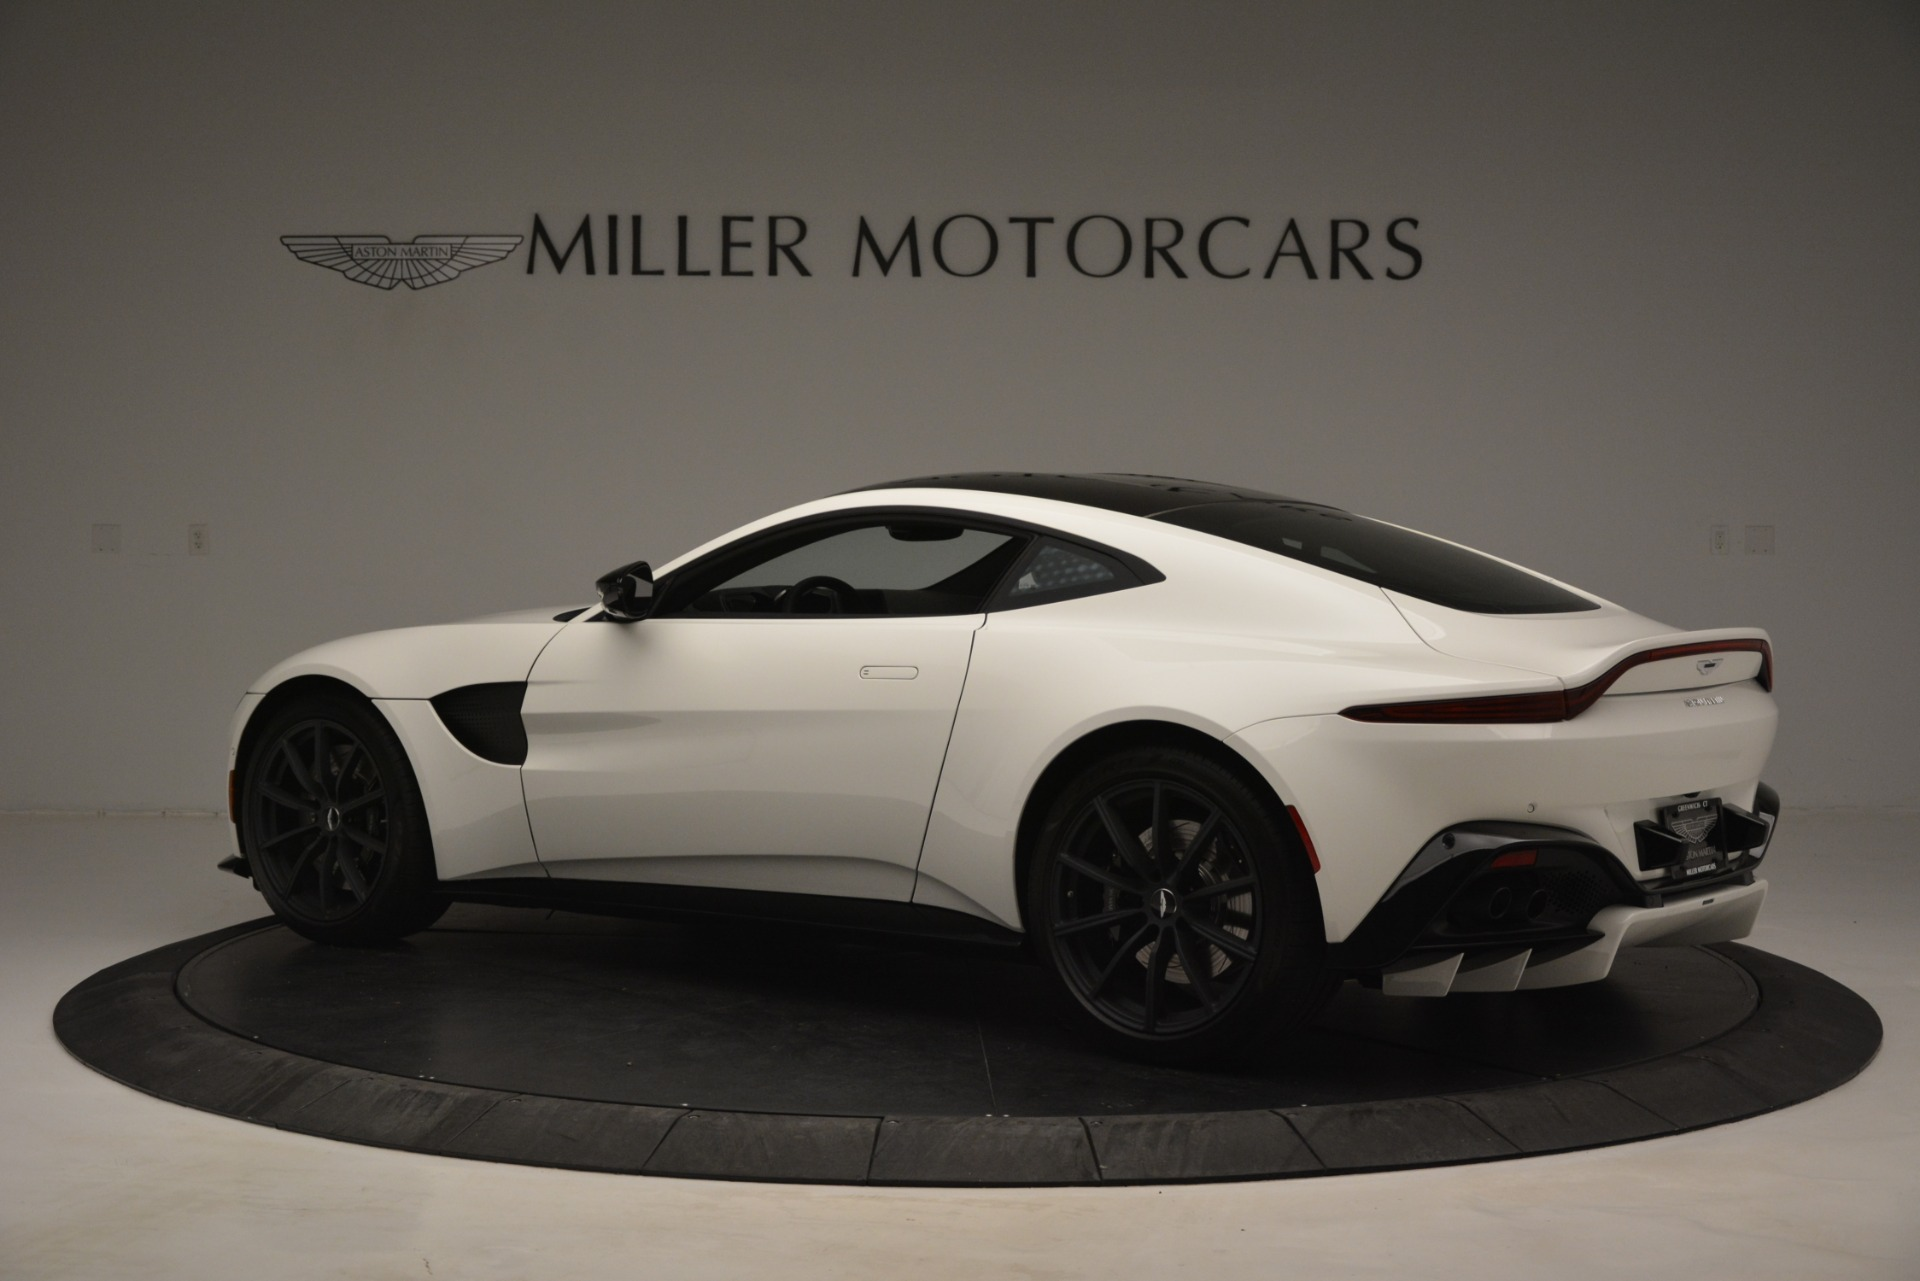 New 2019 Aston Martin Vantage Coupe For Sale In Greenwich, CT. Alfa Romeo of Greenwich, A1362 3053_p4